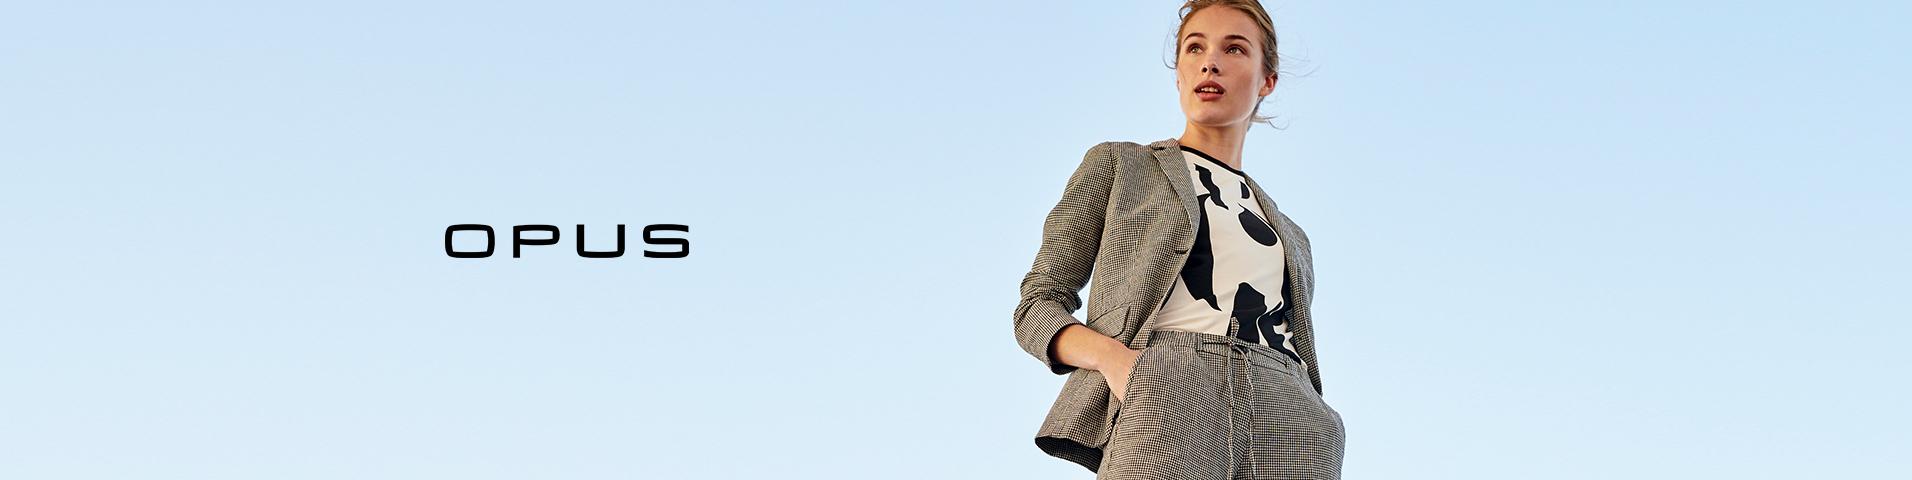 Kleding Kopen Dames.Opus Kleding Online Kopen Gratis Verzending Zalando